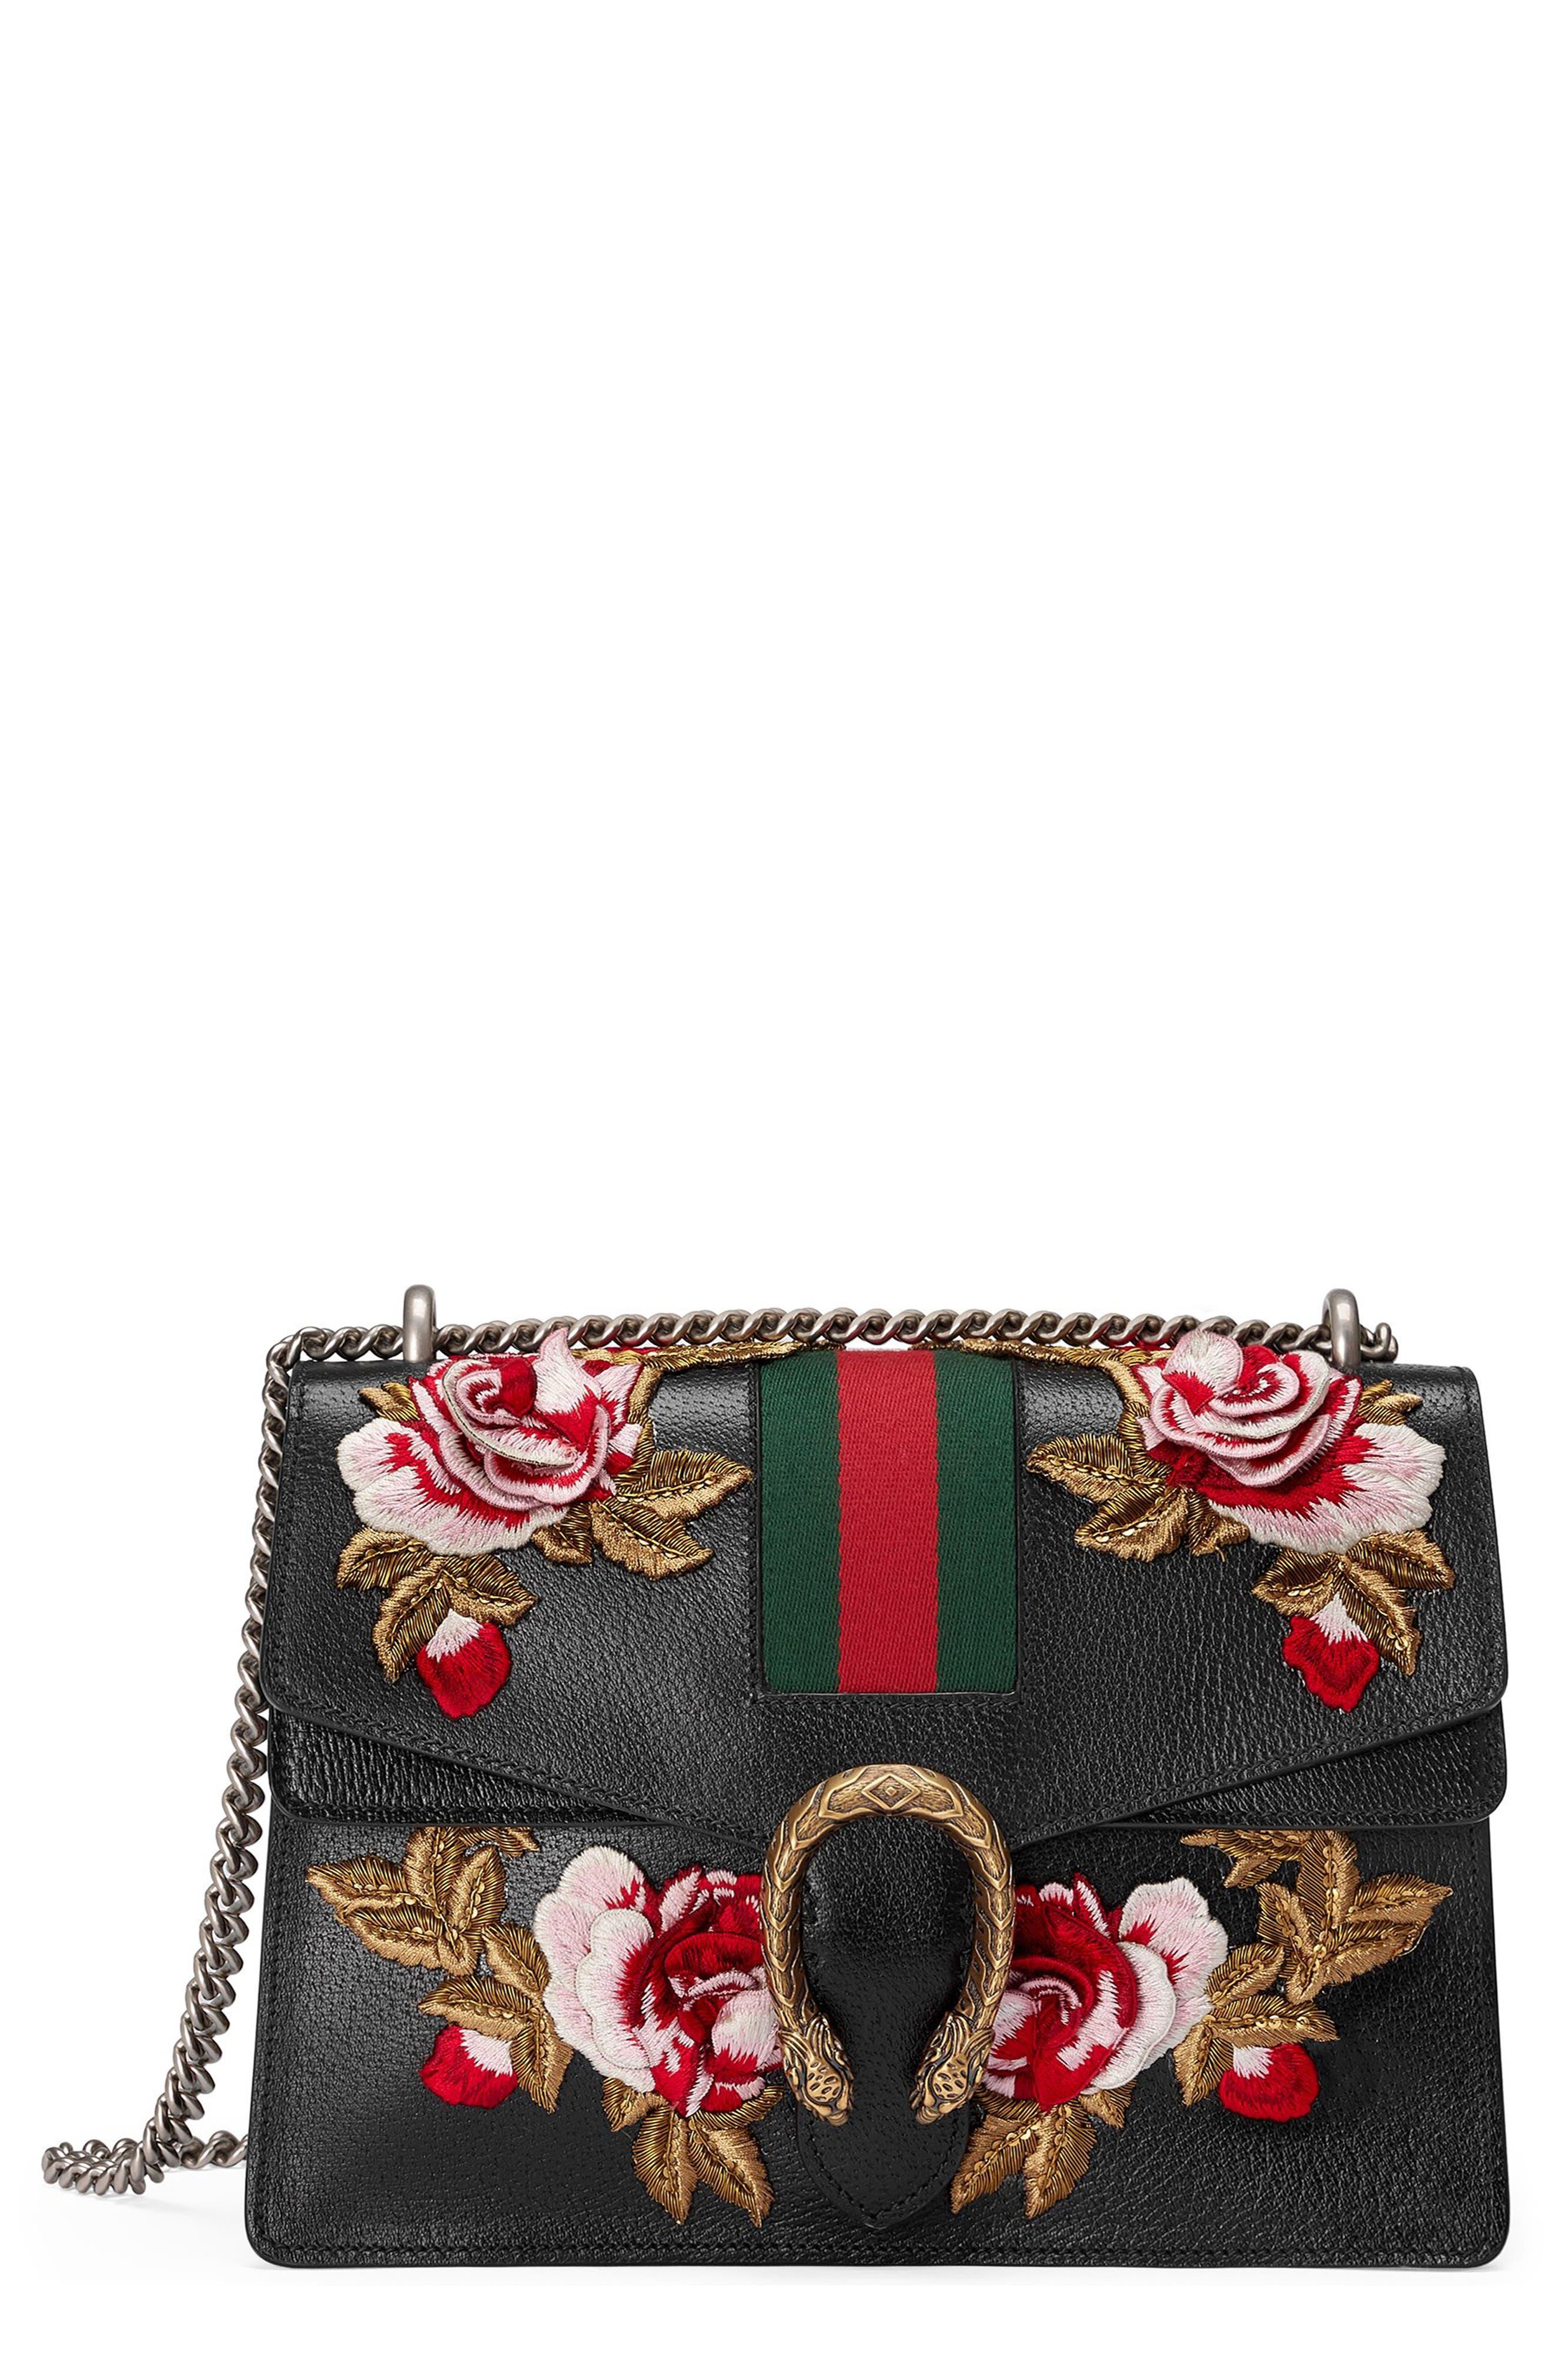 Medium Dionysus Embroidered Roses Leather Shoulder Bag,                             Main thumbnail 1, color,                             Nero/Multi